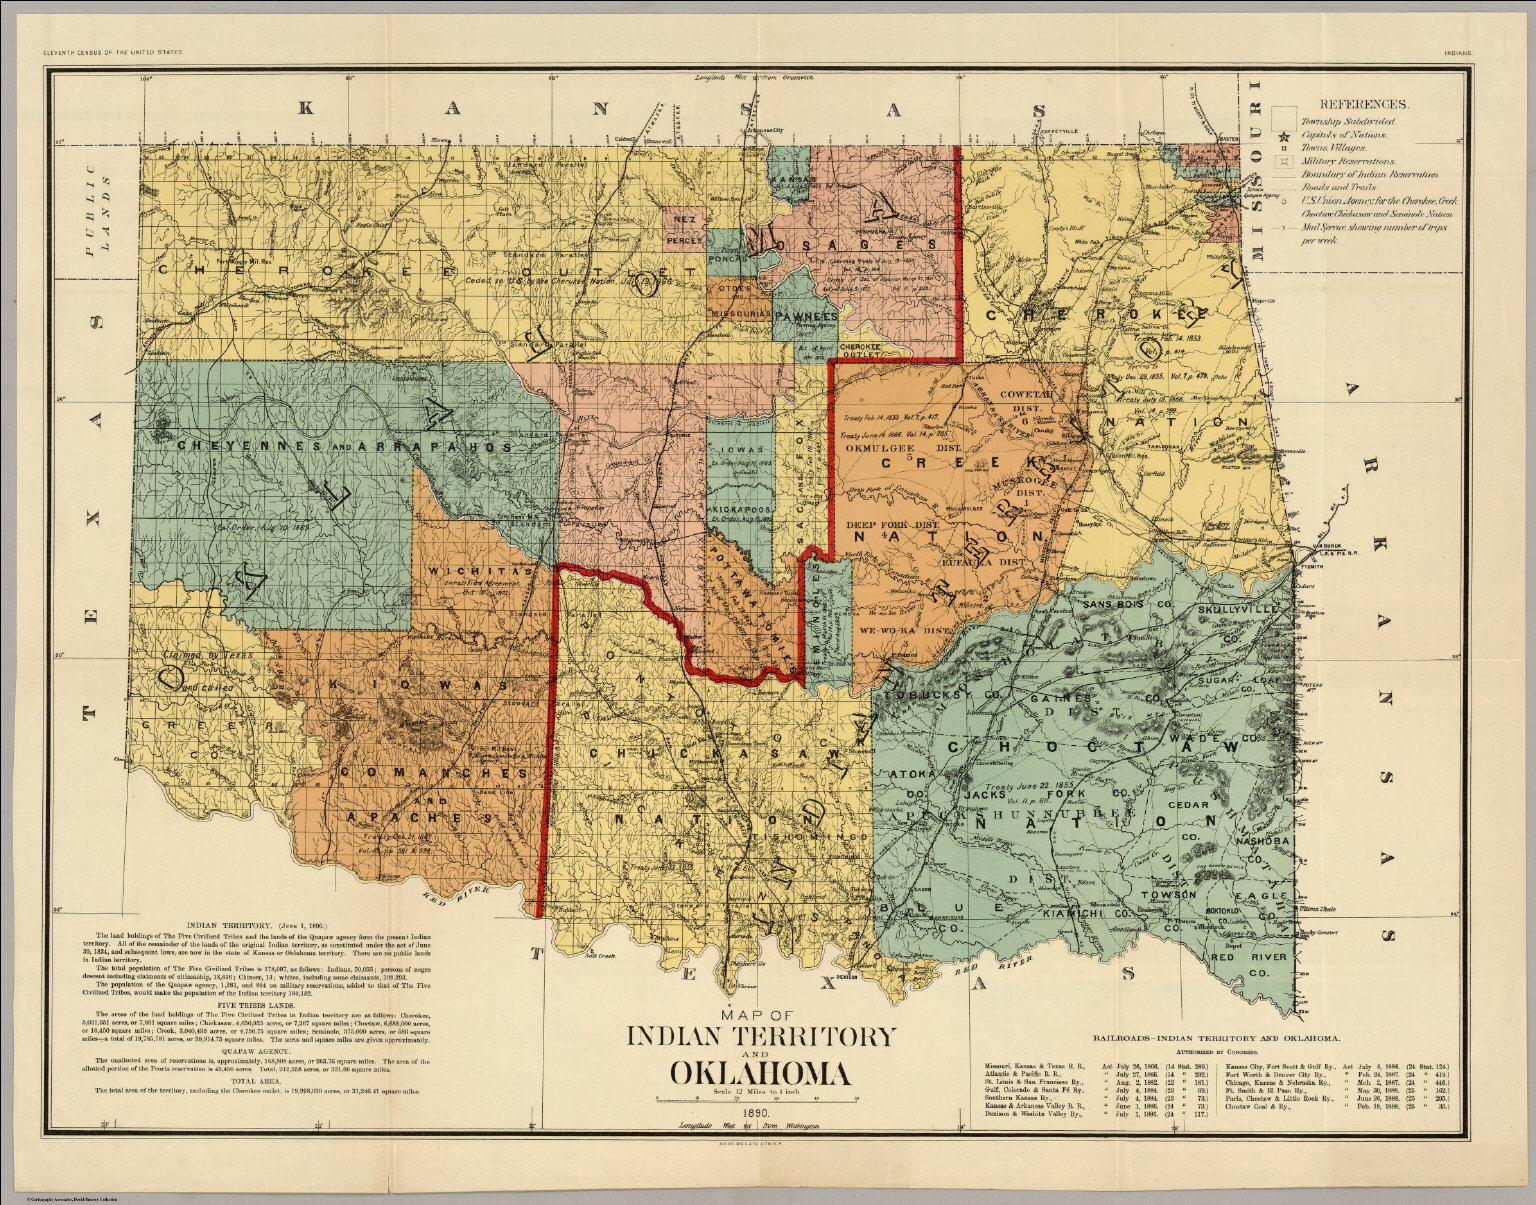 oklahoma indian territory1890 22